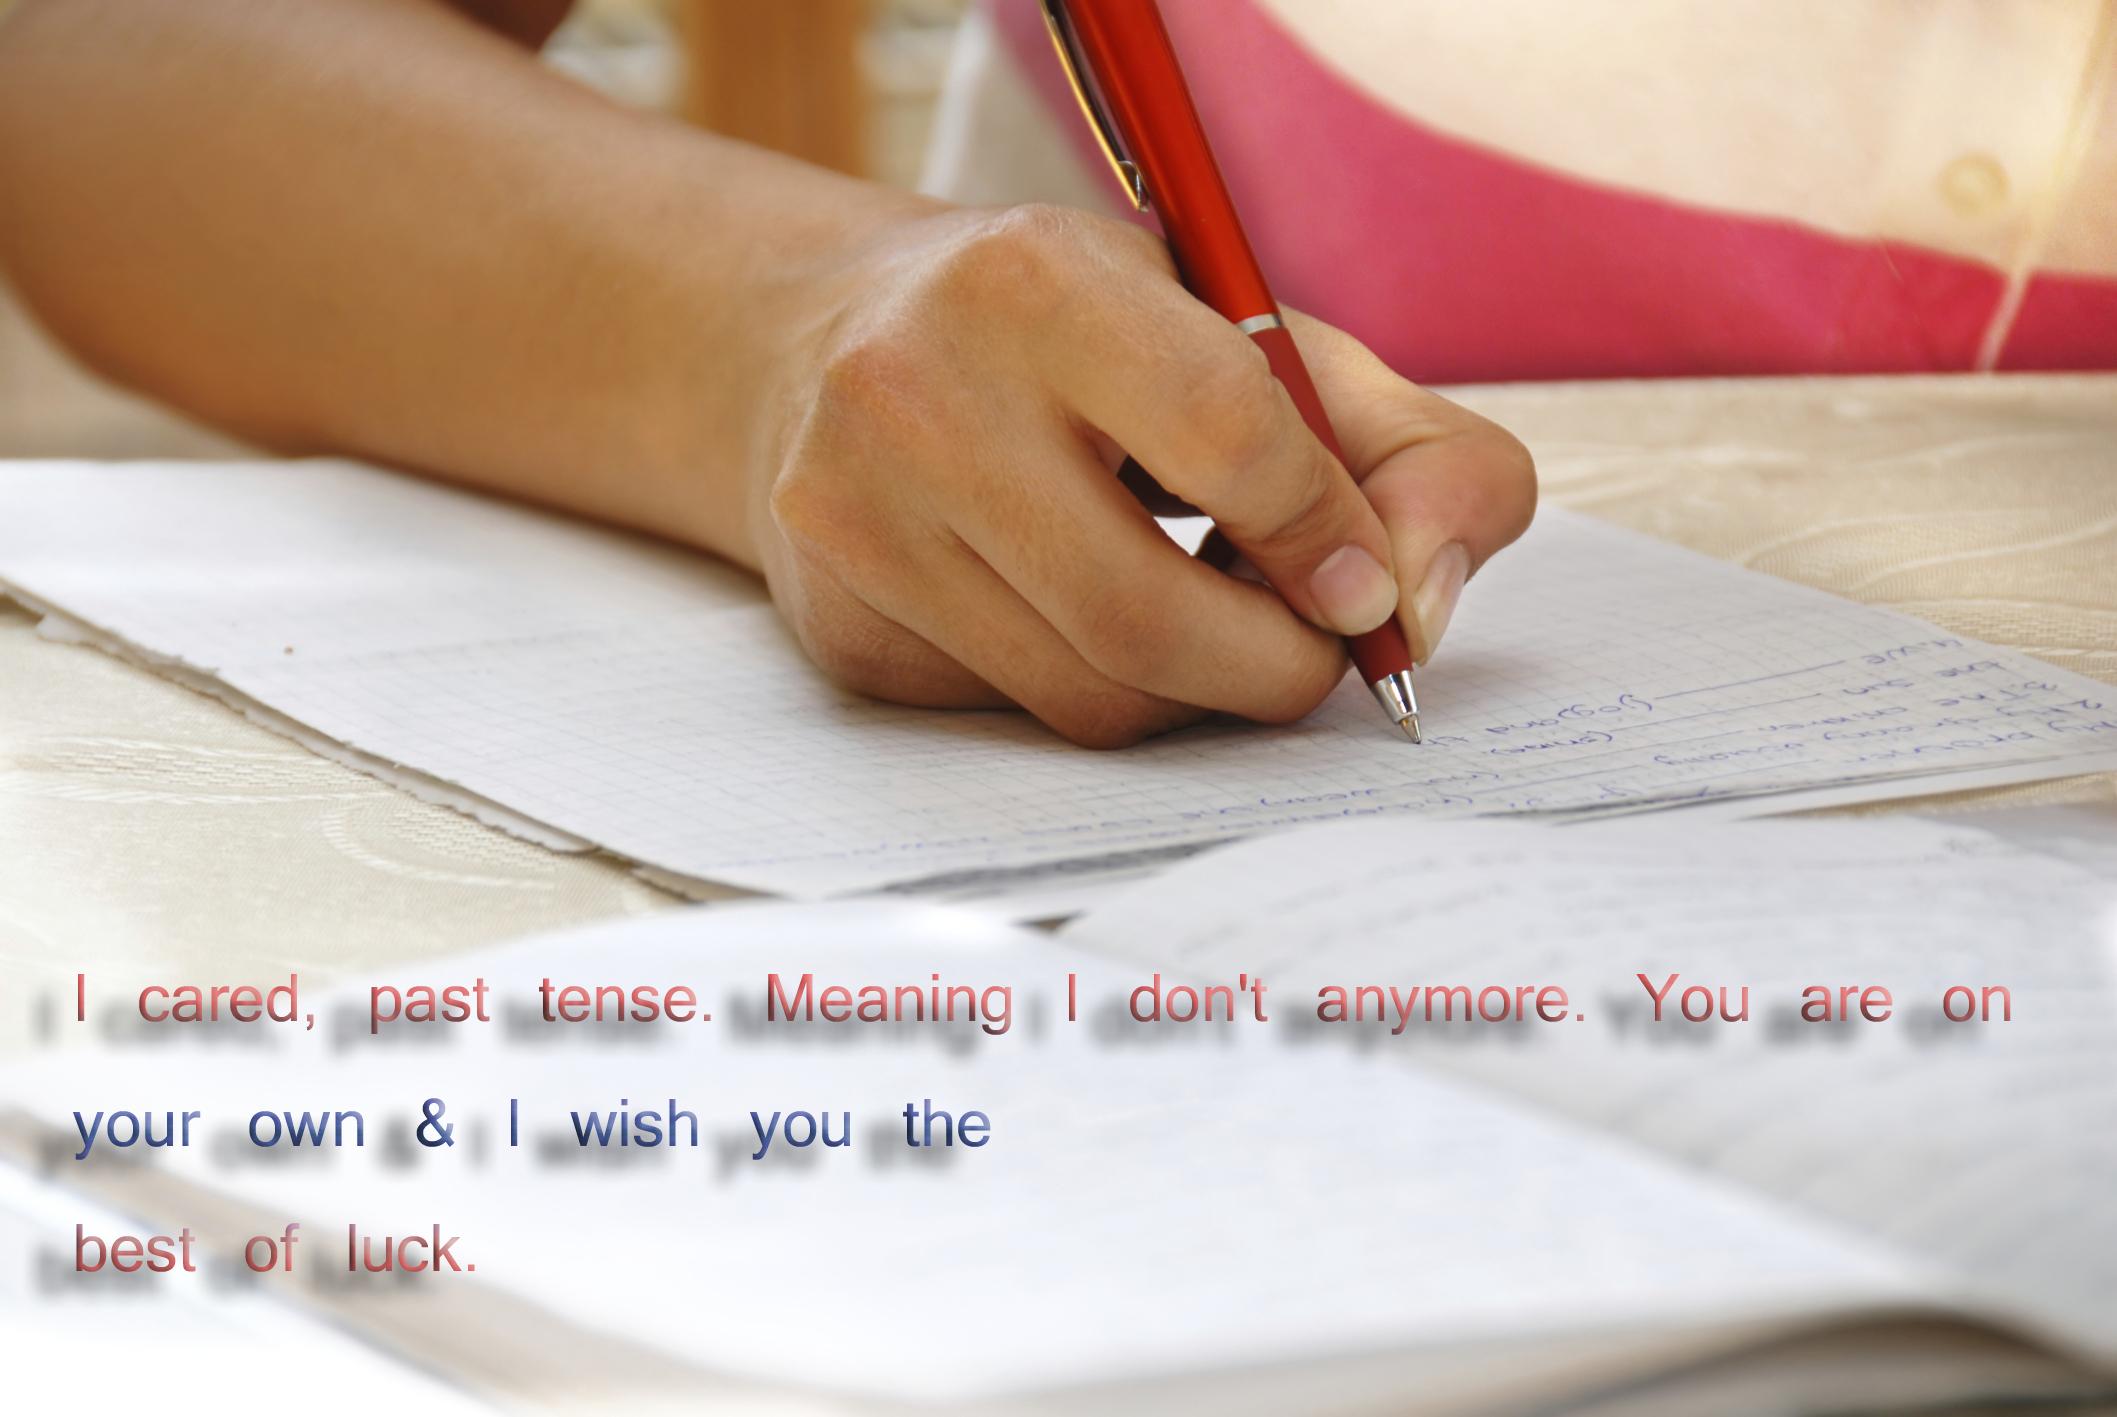 Exams quote #2